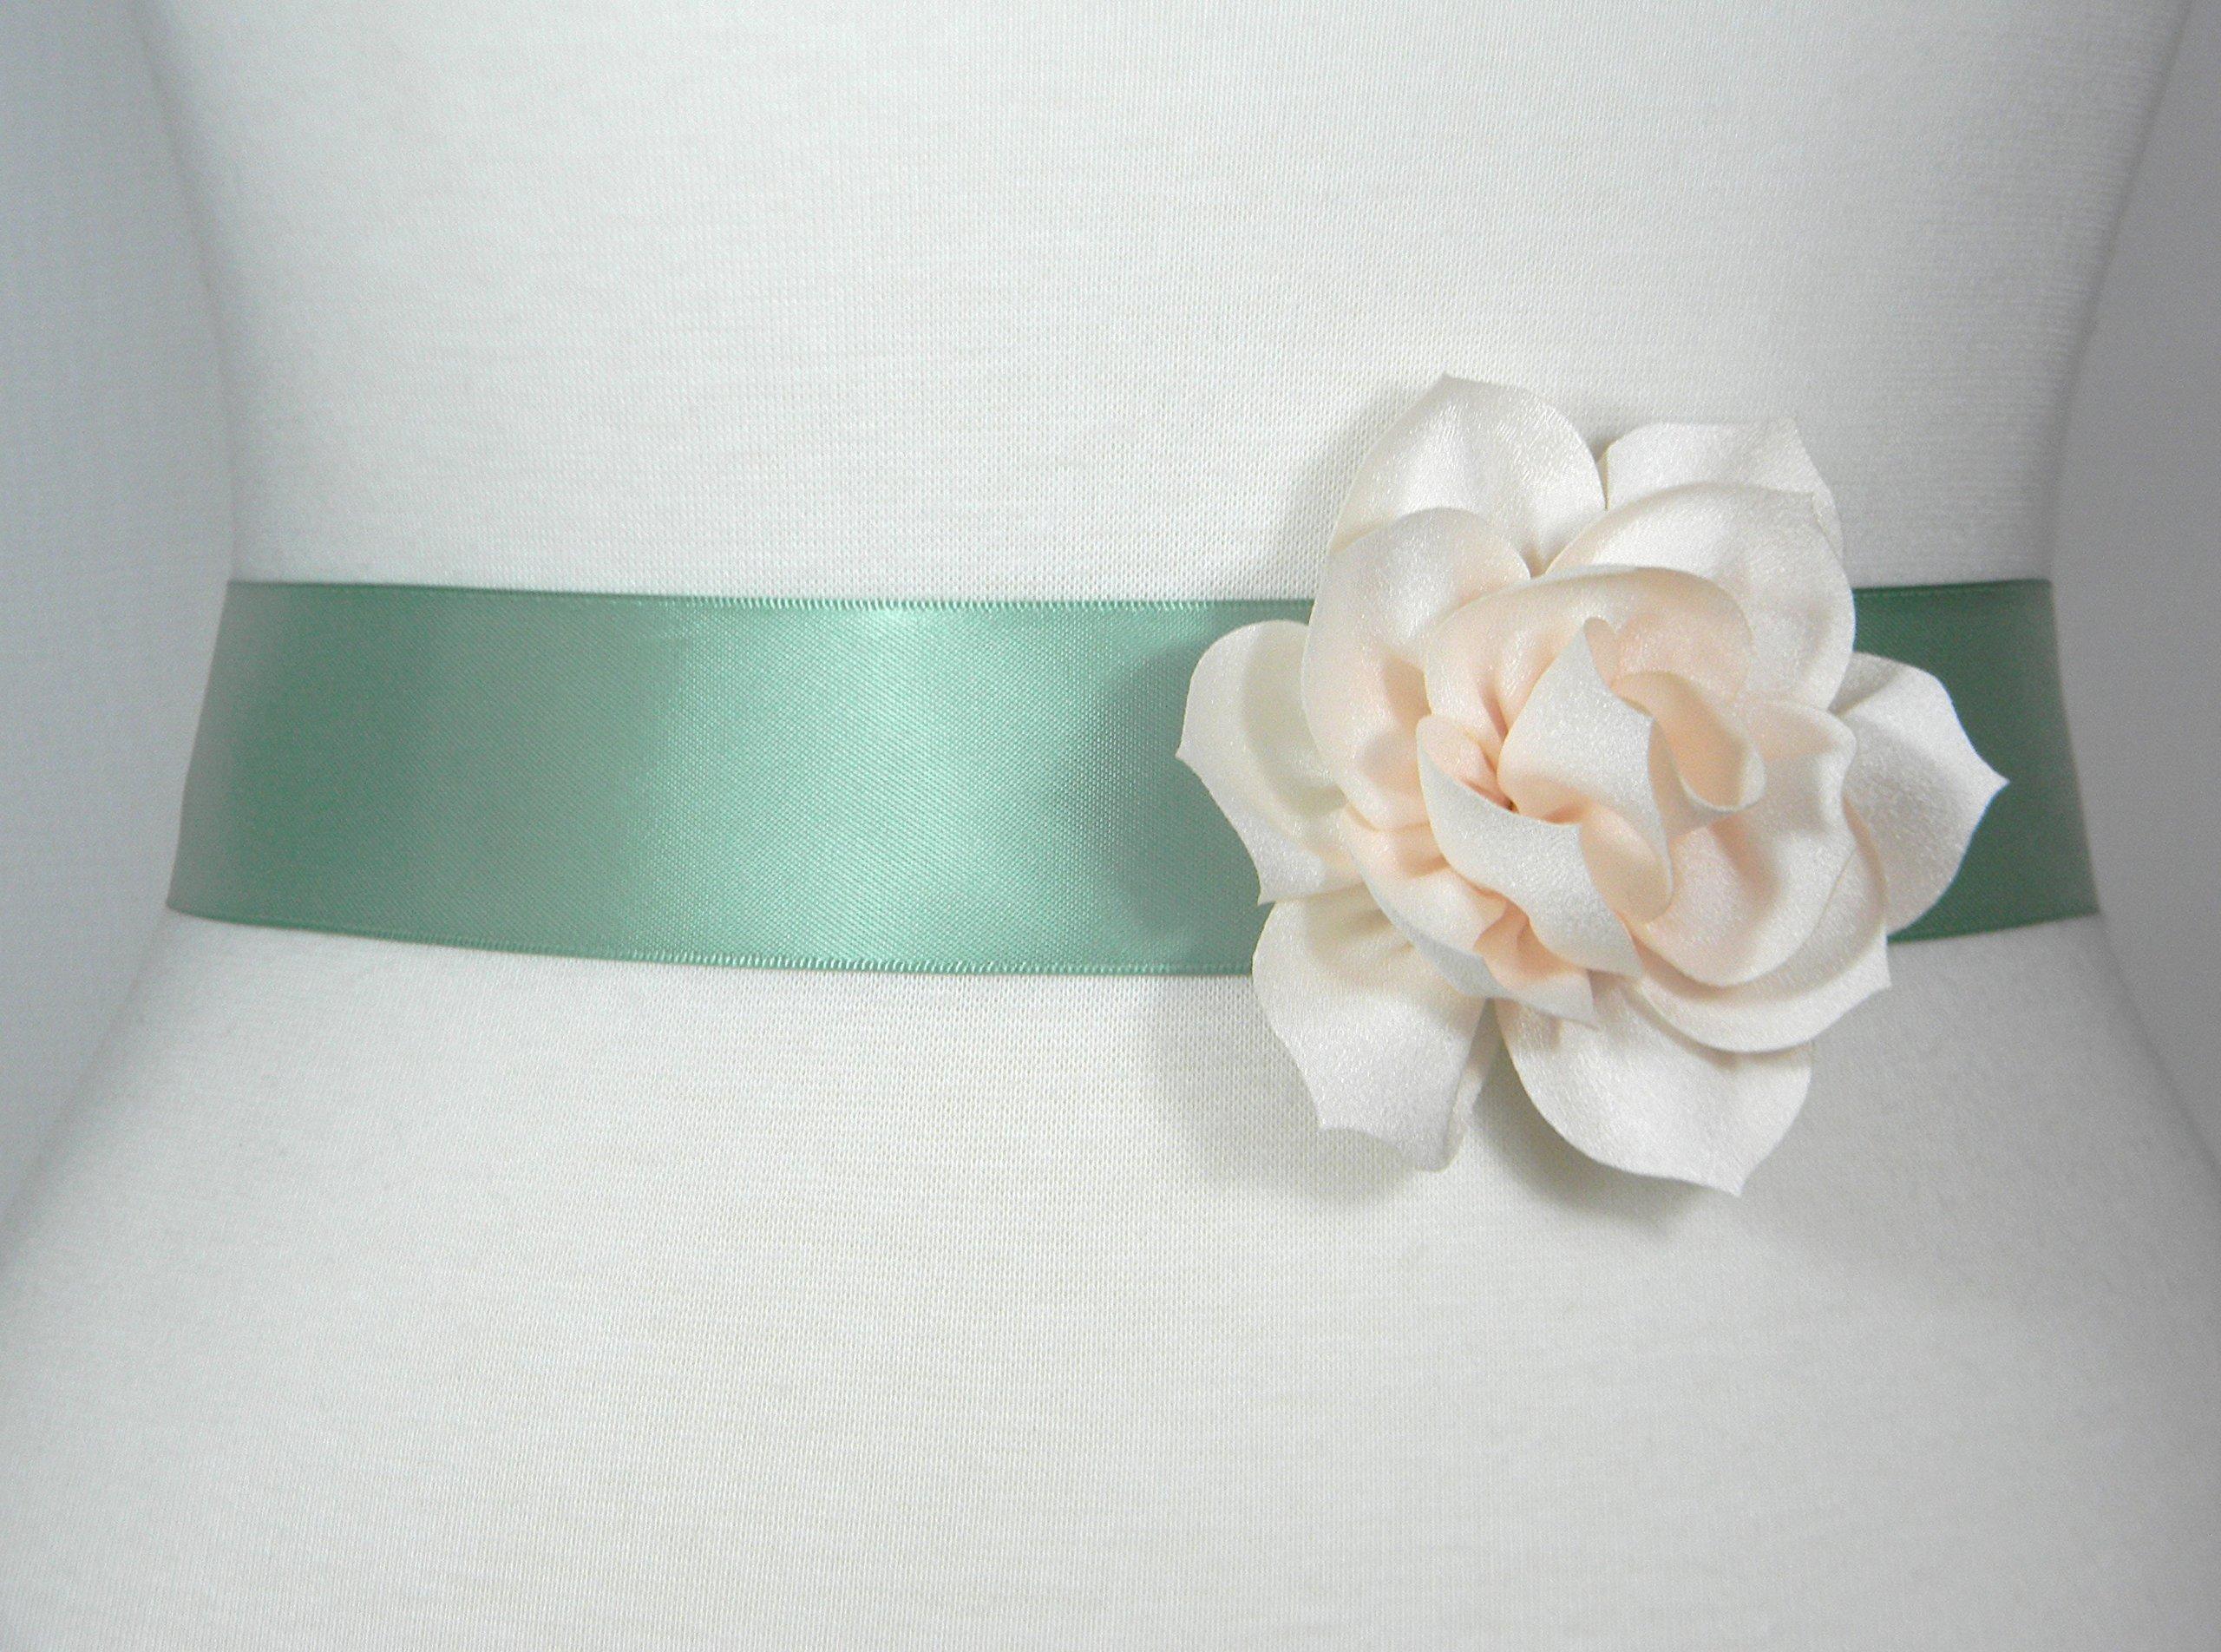 Sage and Light Champagne or White Bridal Sash, Wedding Belt, Bridal Belt, Flower Girl Dress Sash, Bridesmaid Belt, Satin Sash, Wedding Dress Belt, Simple Sash POSY